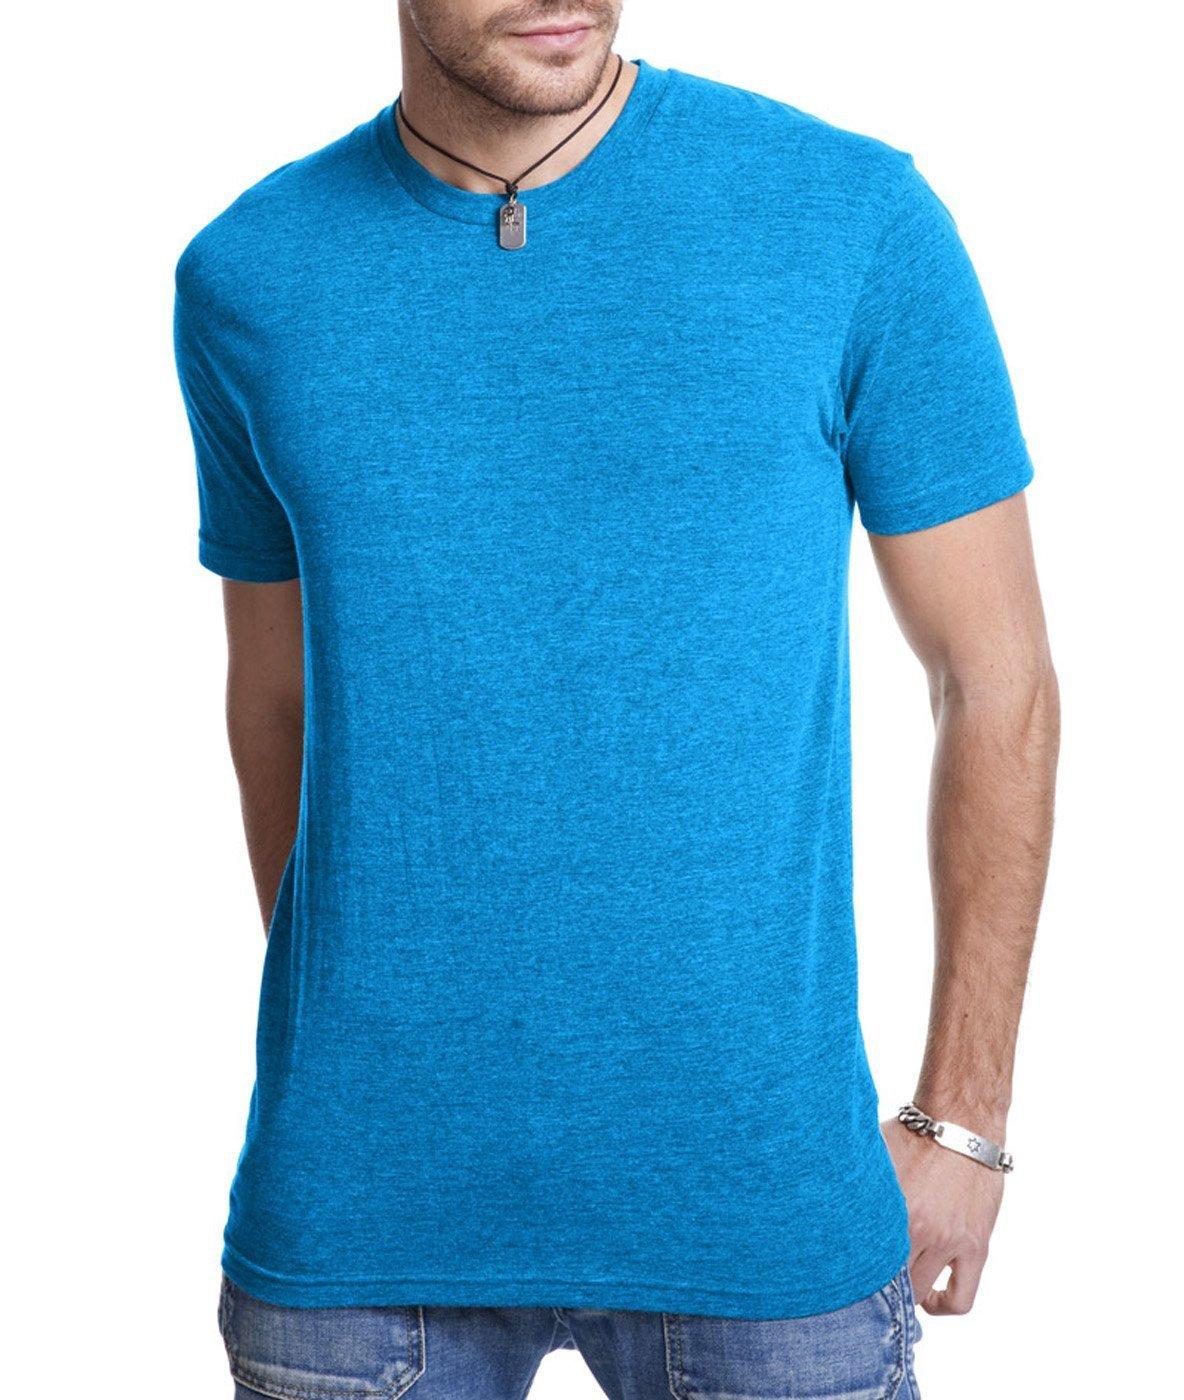 Next Level SHIRT メンズ B07CGQR6CP Large|Viintage Turquoise Viintage Turquoise Large